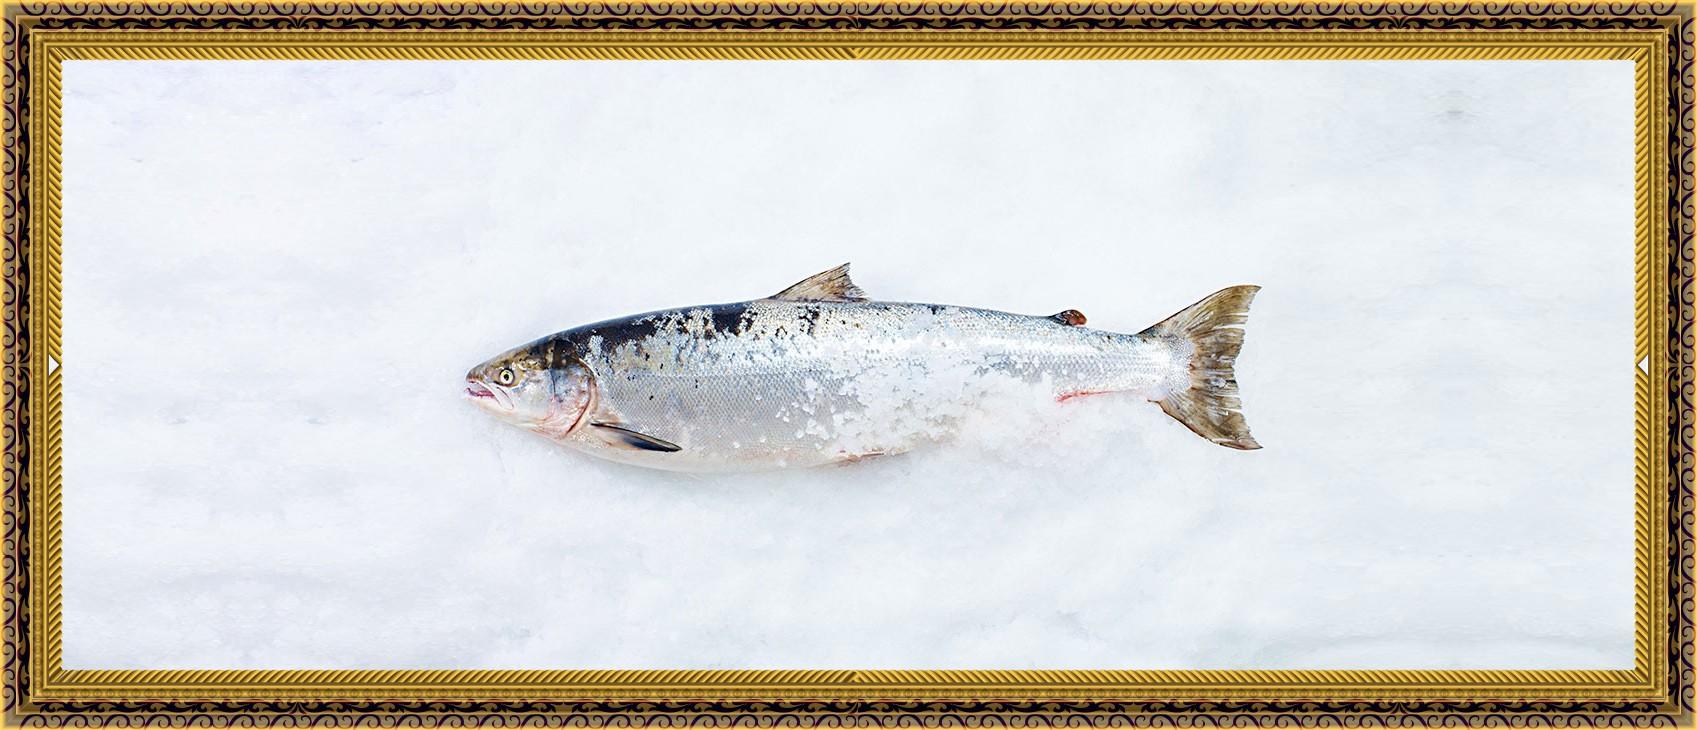 The Smoked Salmon Celebration by Daniel Boulud